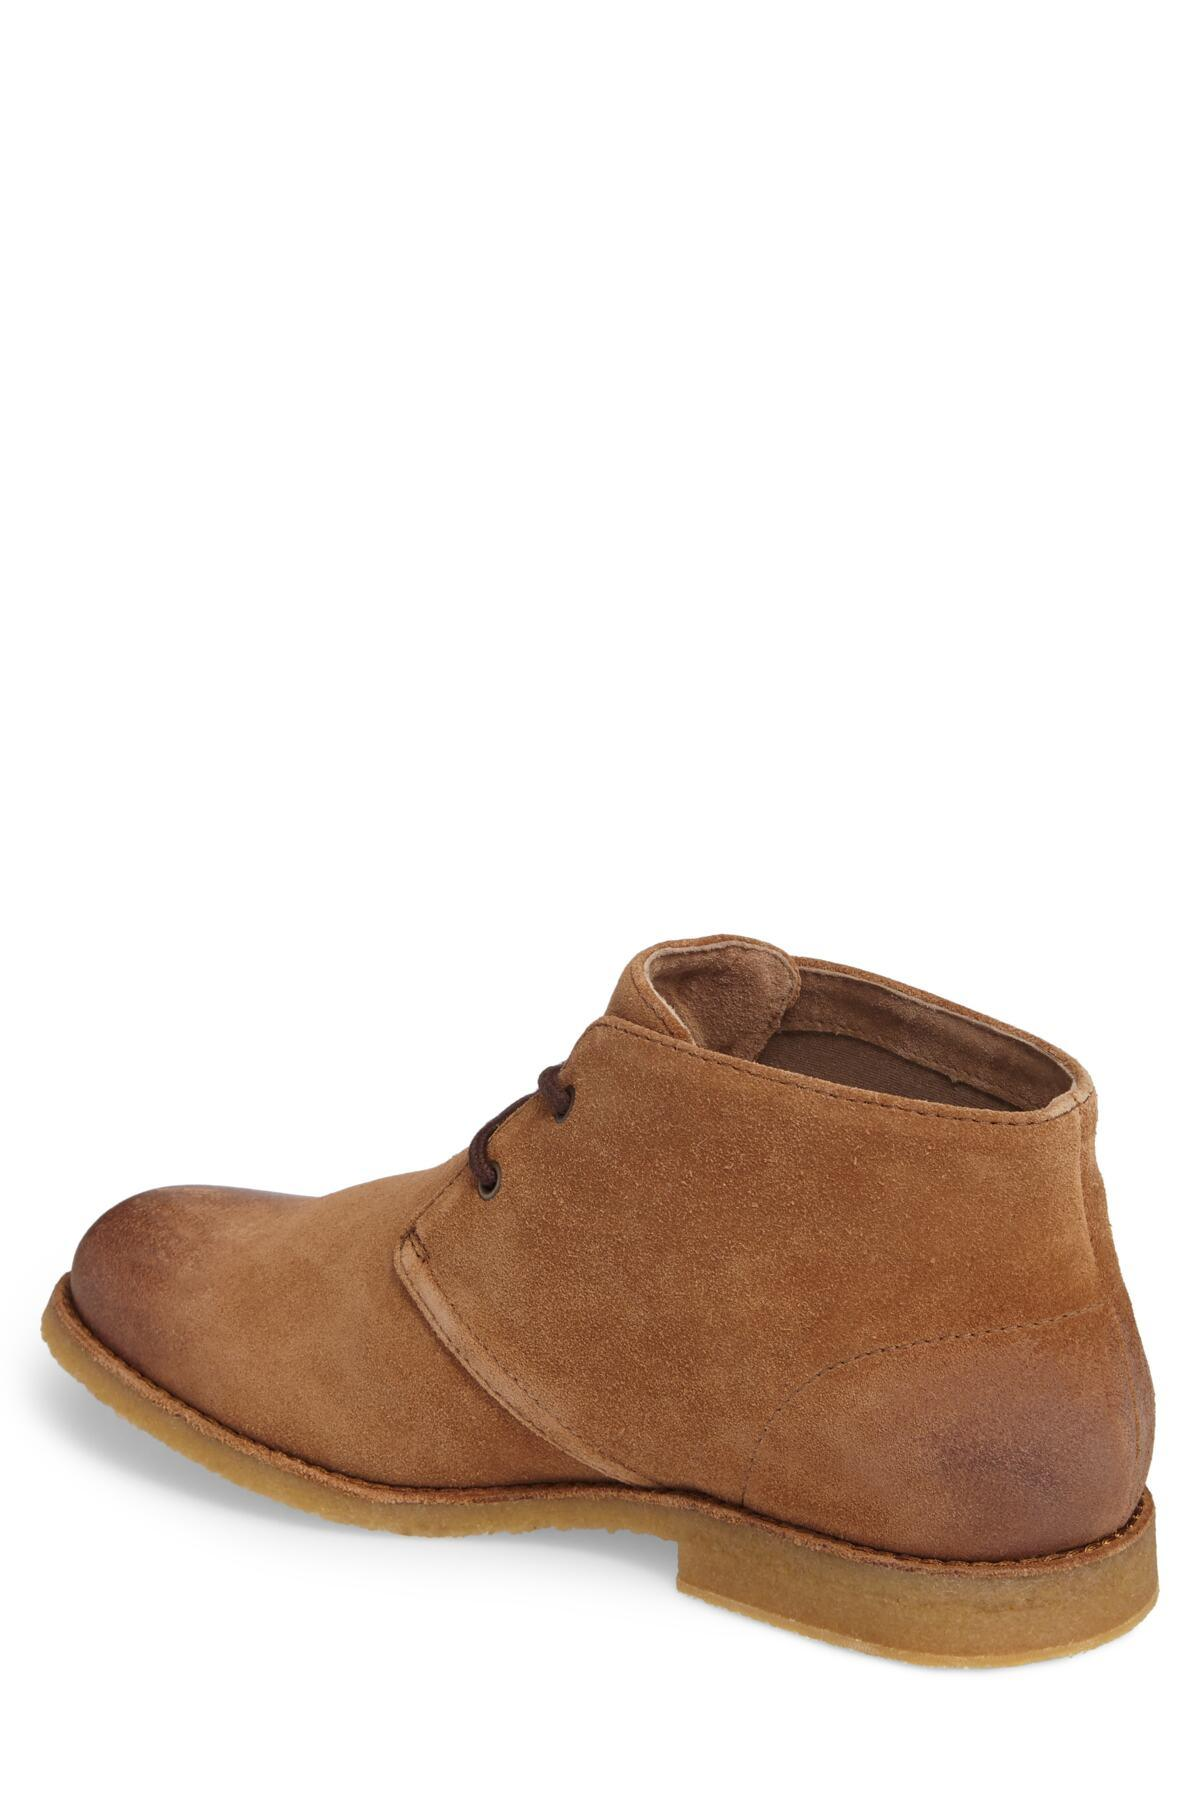 331a7d94424 Lyst - UGG (r) Leighton Chukka Waterproof Boot (men) in Brown for Men